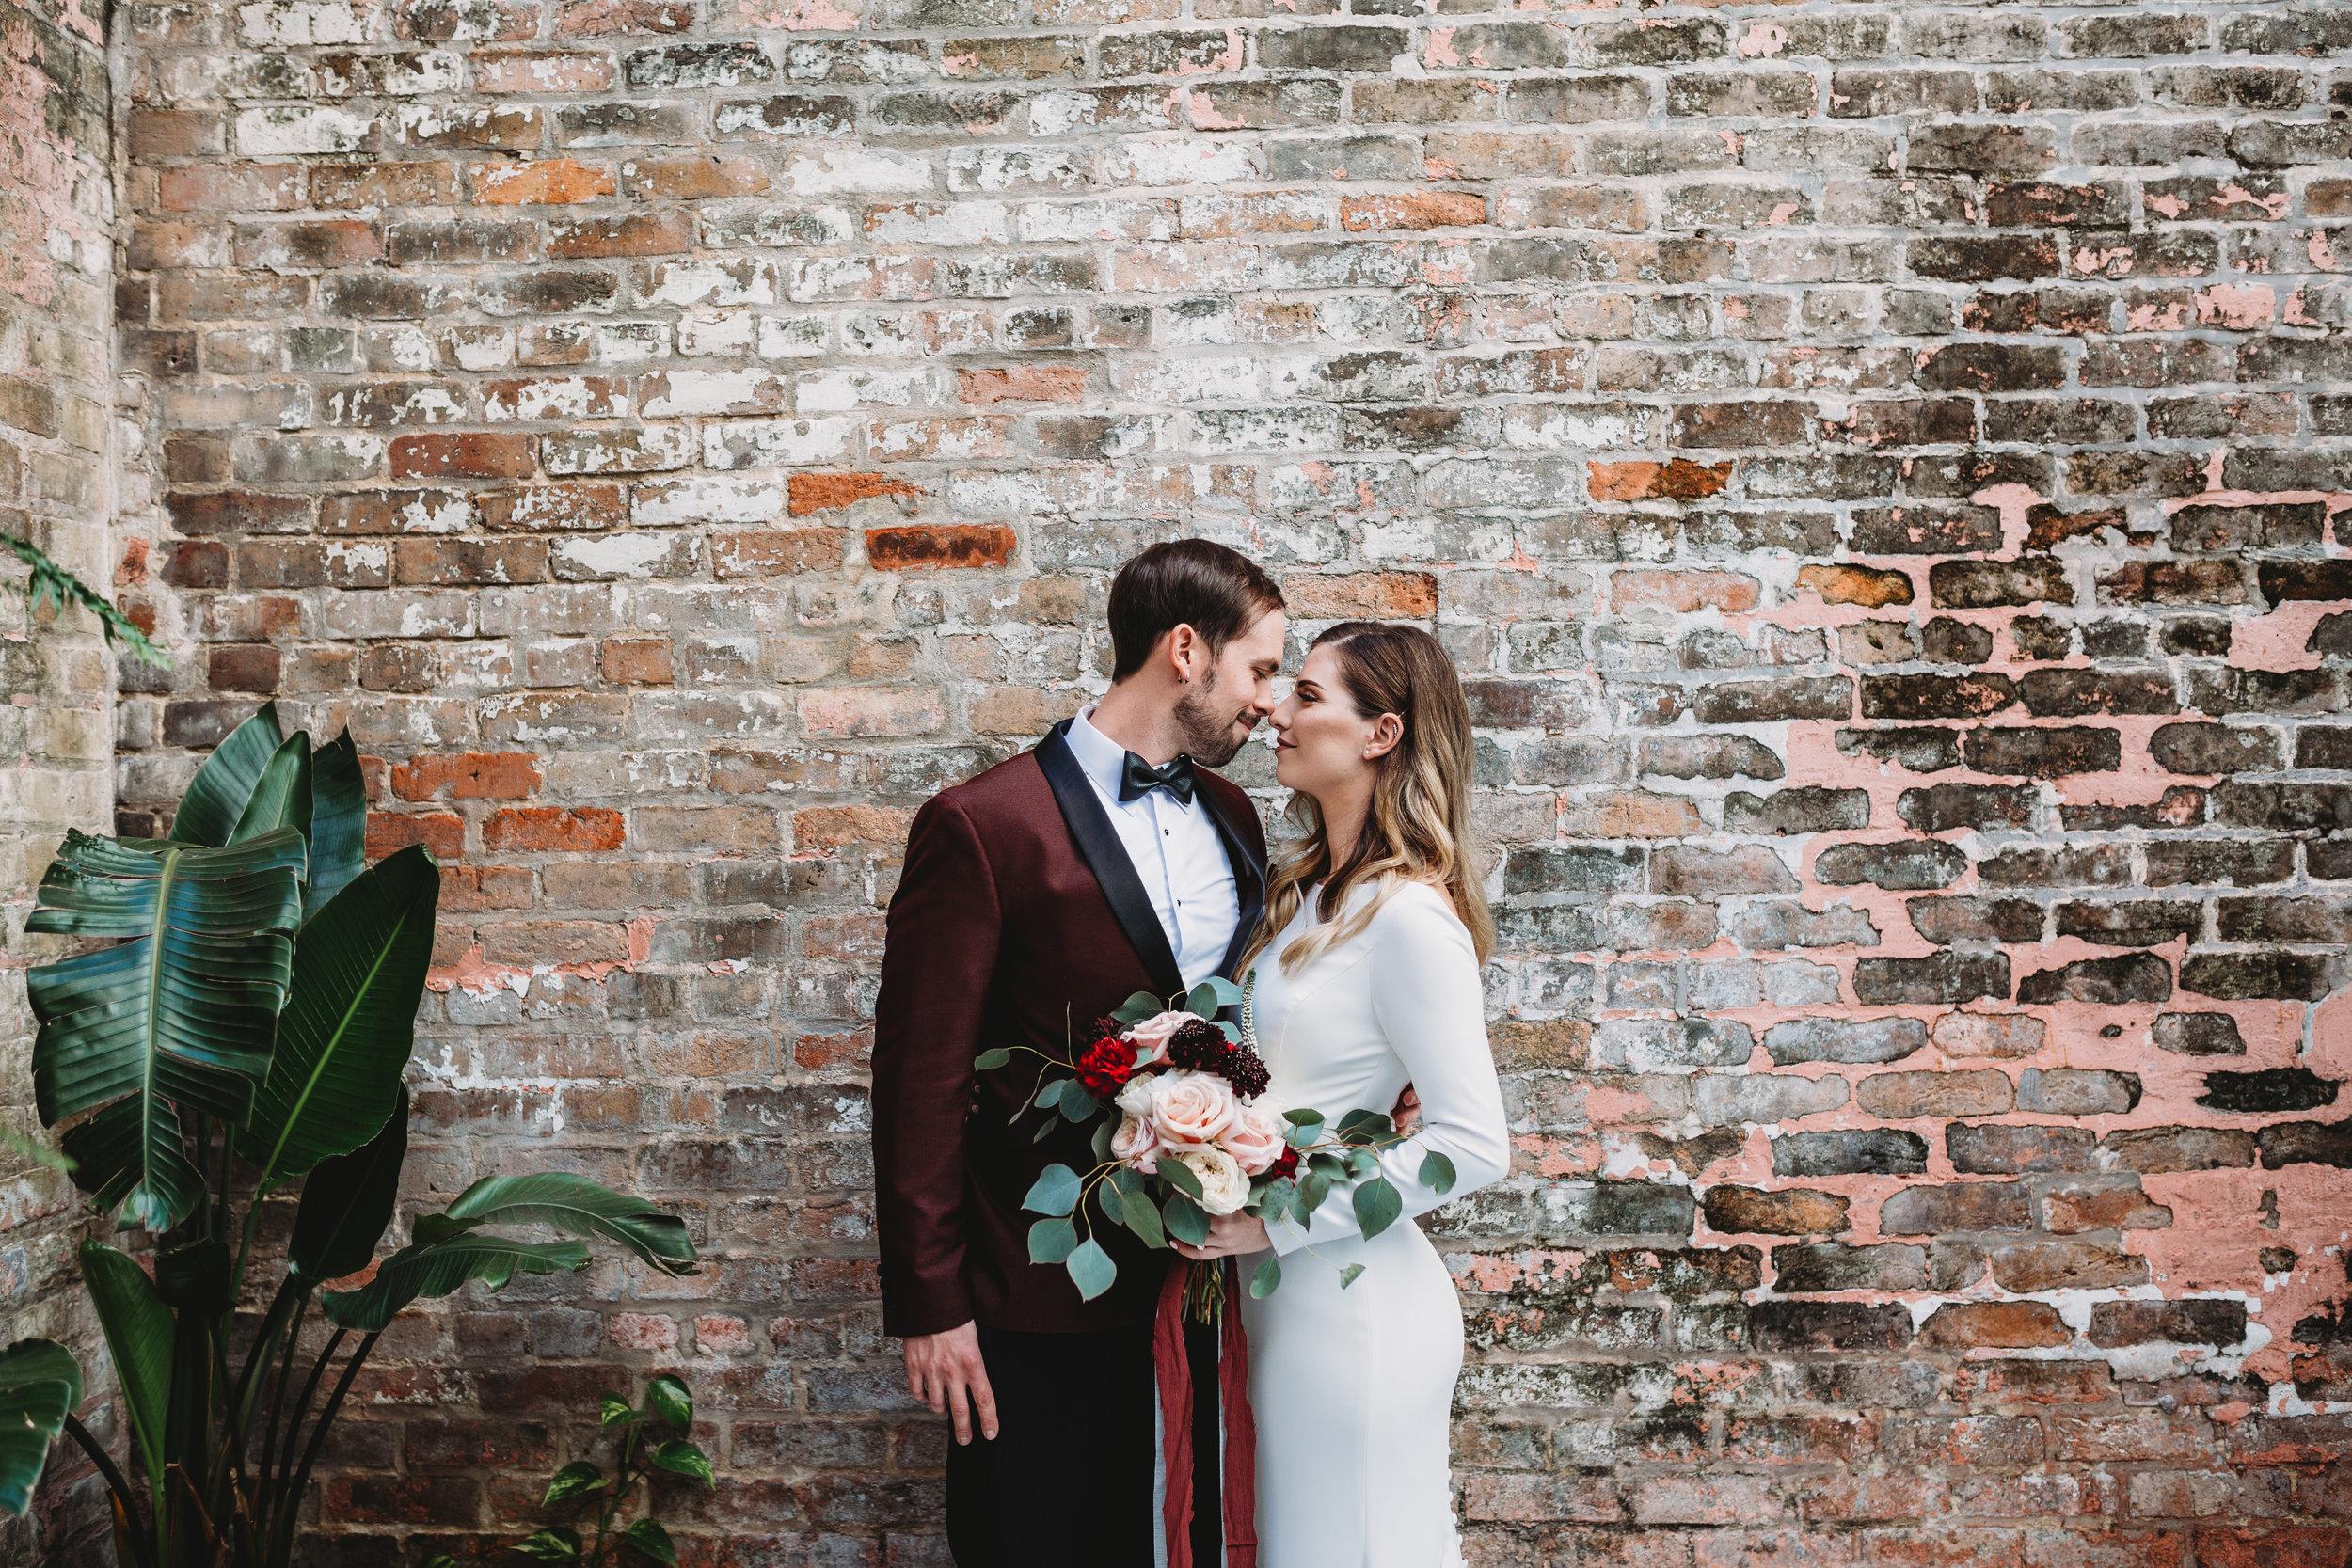 Wedding at Catahoula Hotel New Orleans Wedding Photographer20.jpg